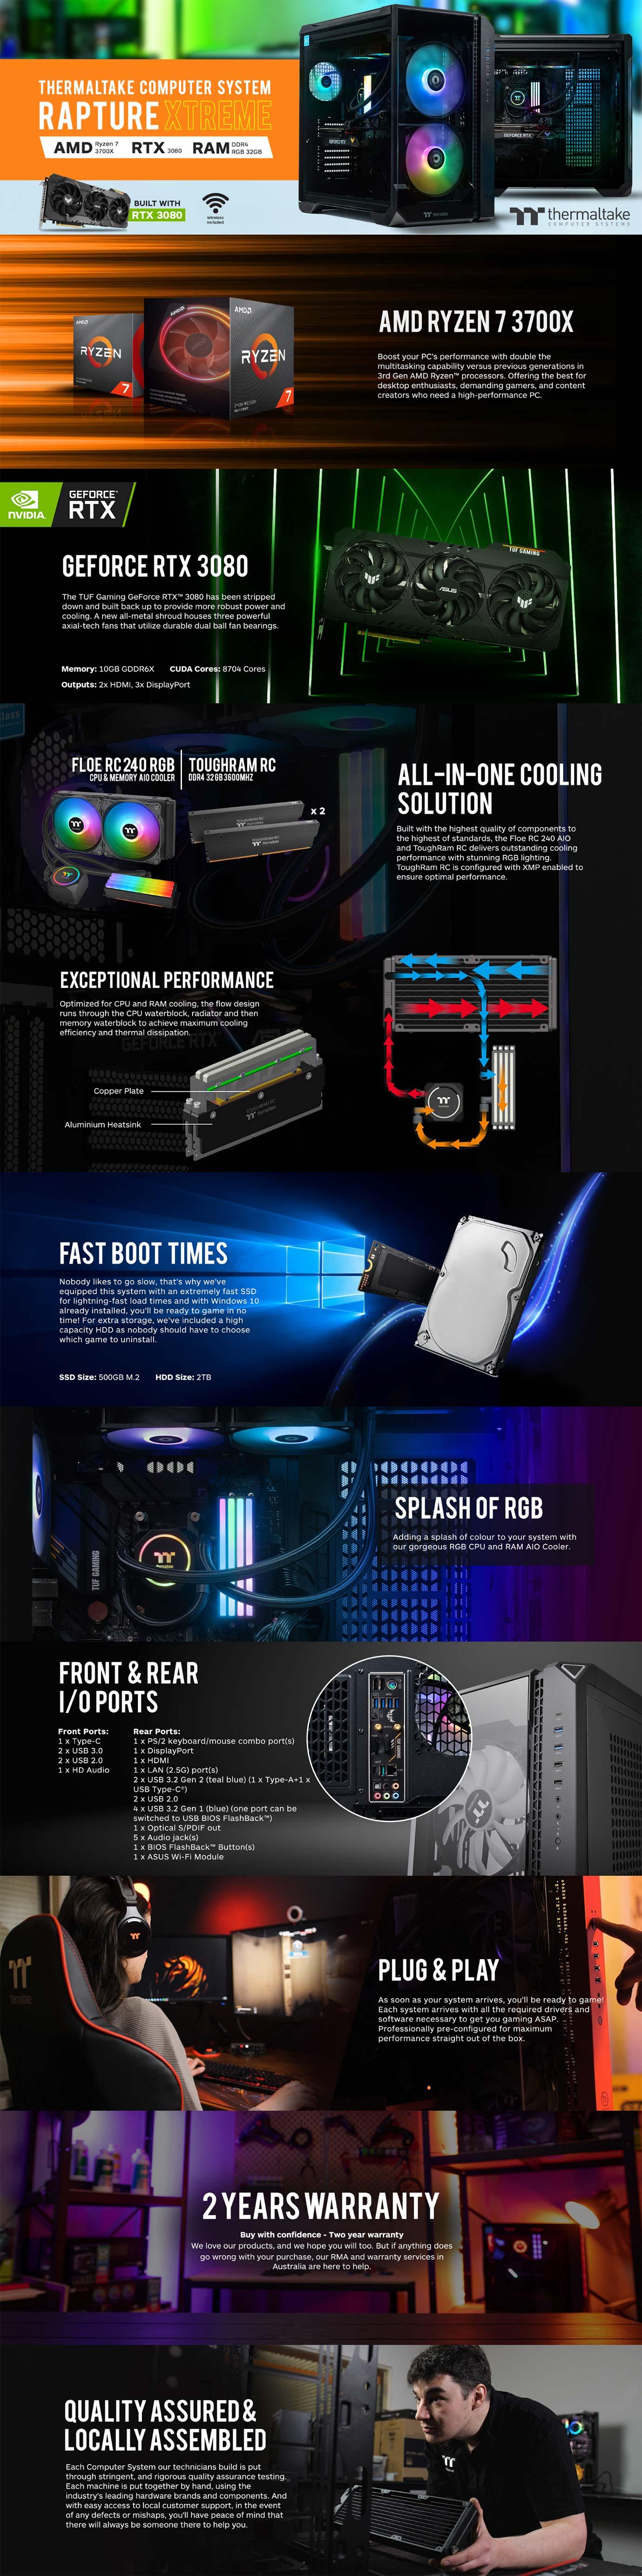 Thermaltake-Rapture-Xtreme-AMD-Computer-System.jpg